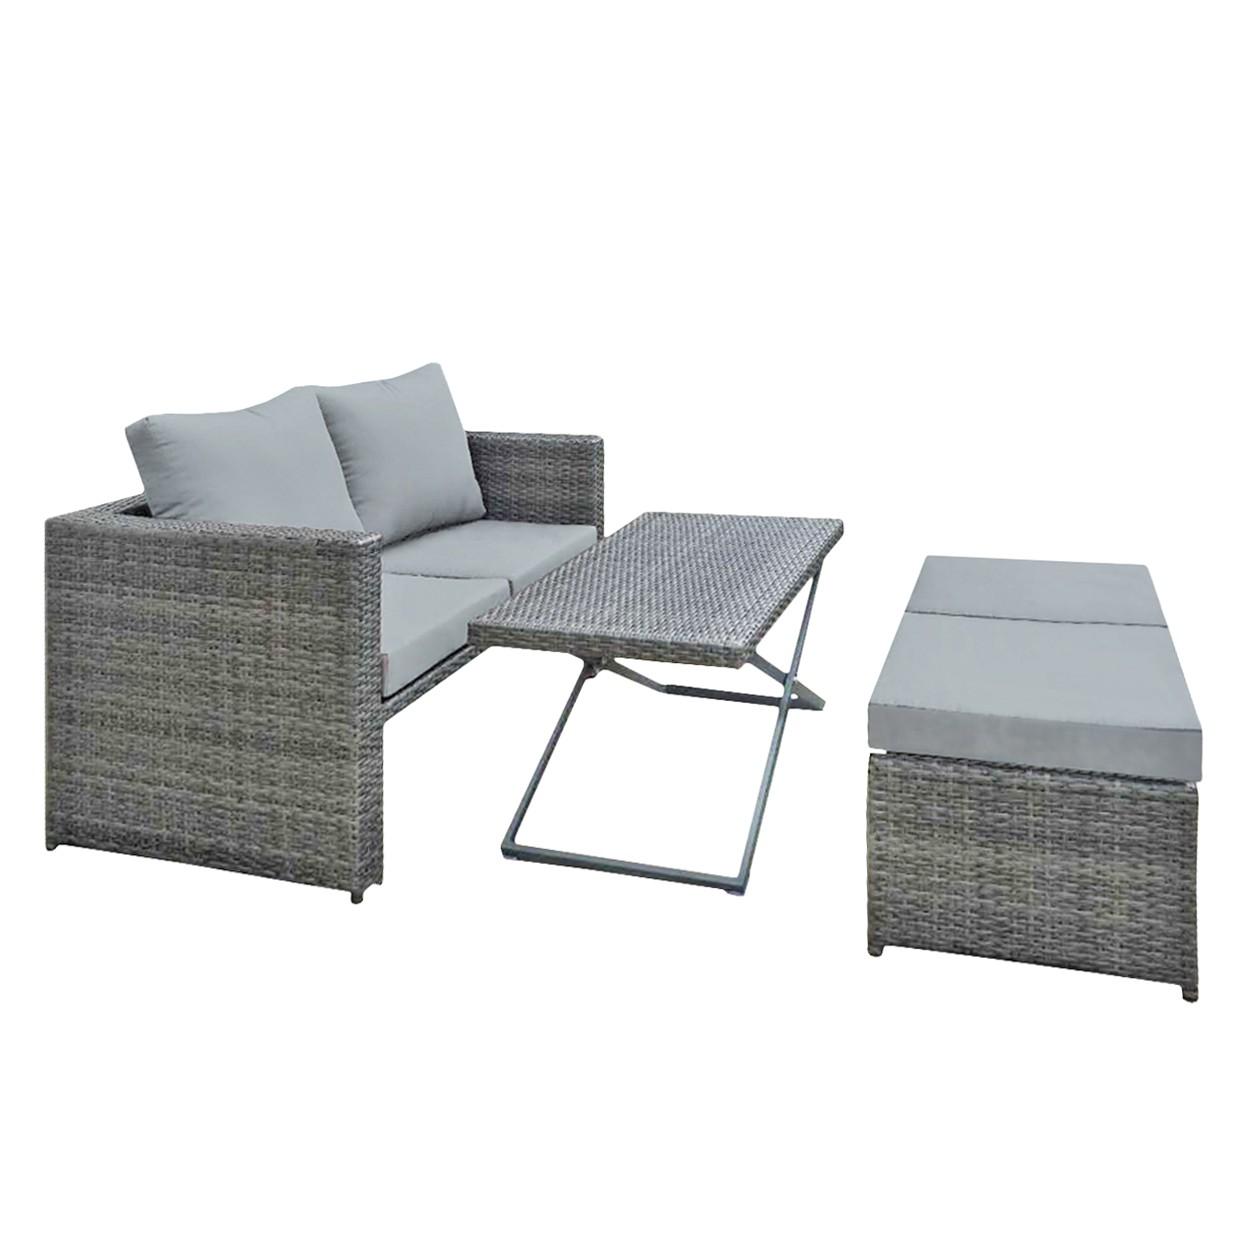 polyrattan sitzgruppe grau polyrattan sofa sitzgruppe lounge grau kaufen bei mucola polyrattan. Black Bedroom Furniture Sets. Home Design Ideas